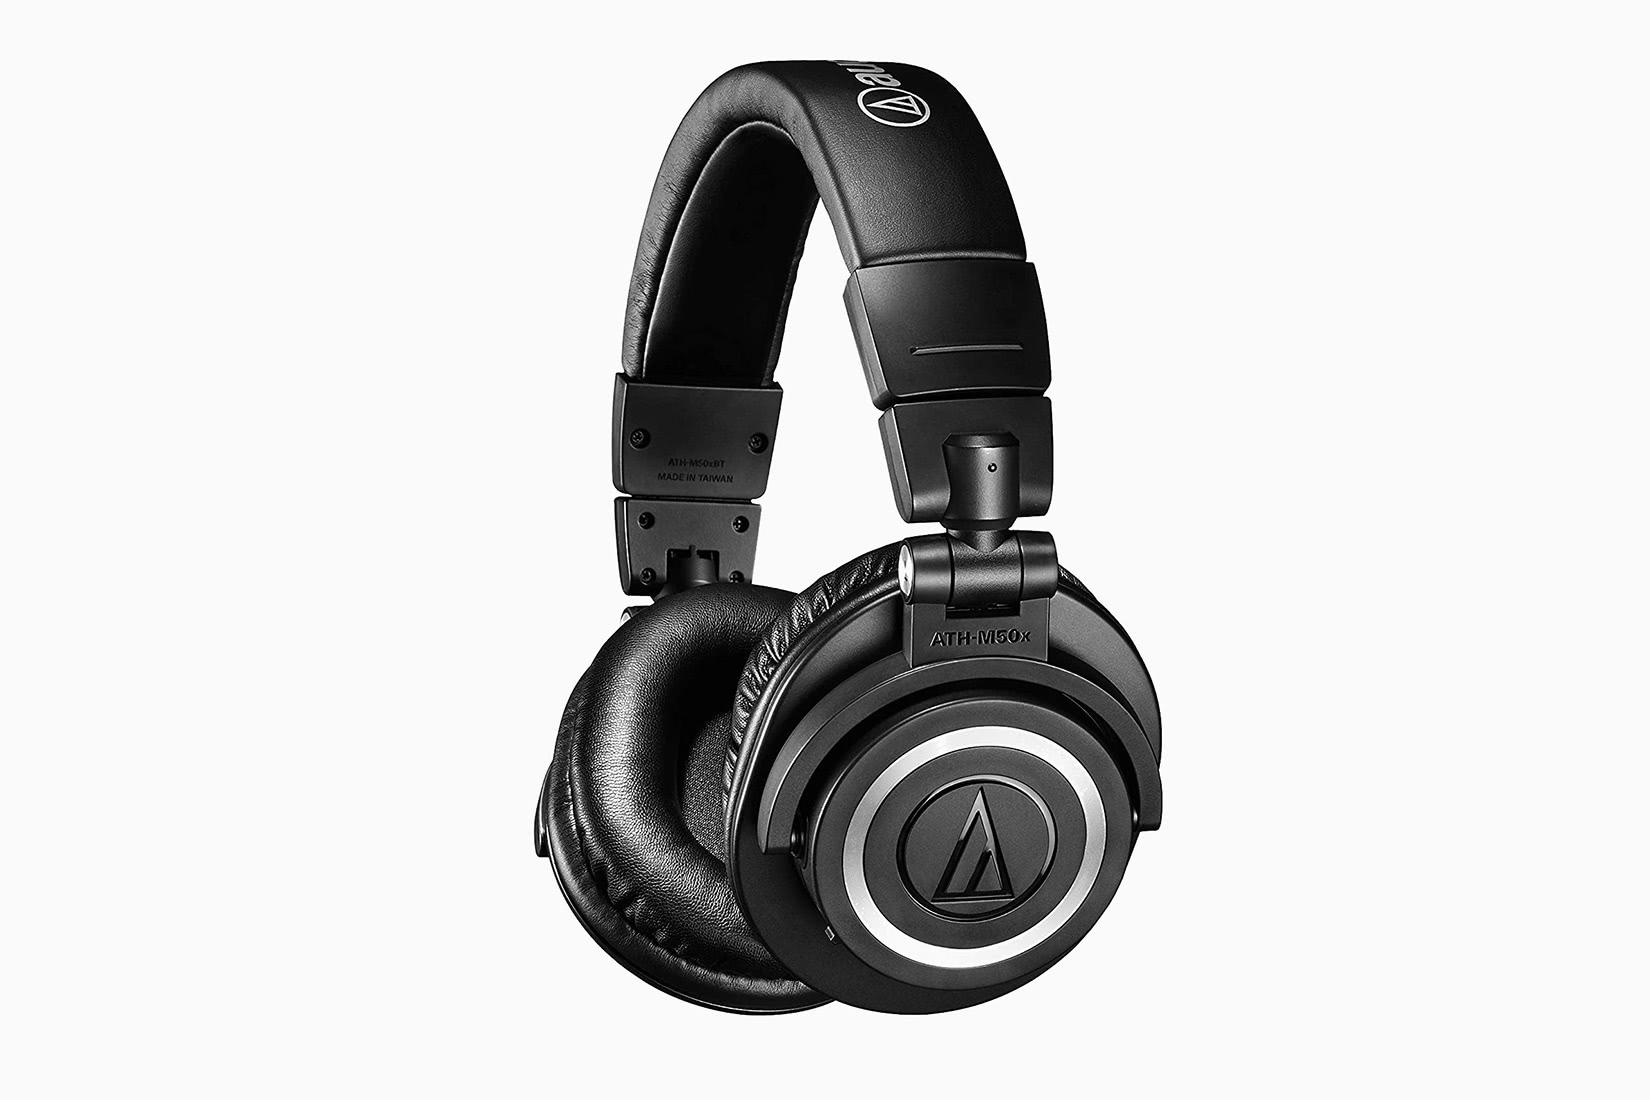 best over-ear headphones audio technica ATH M50xBT review - Luxe Digital